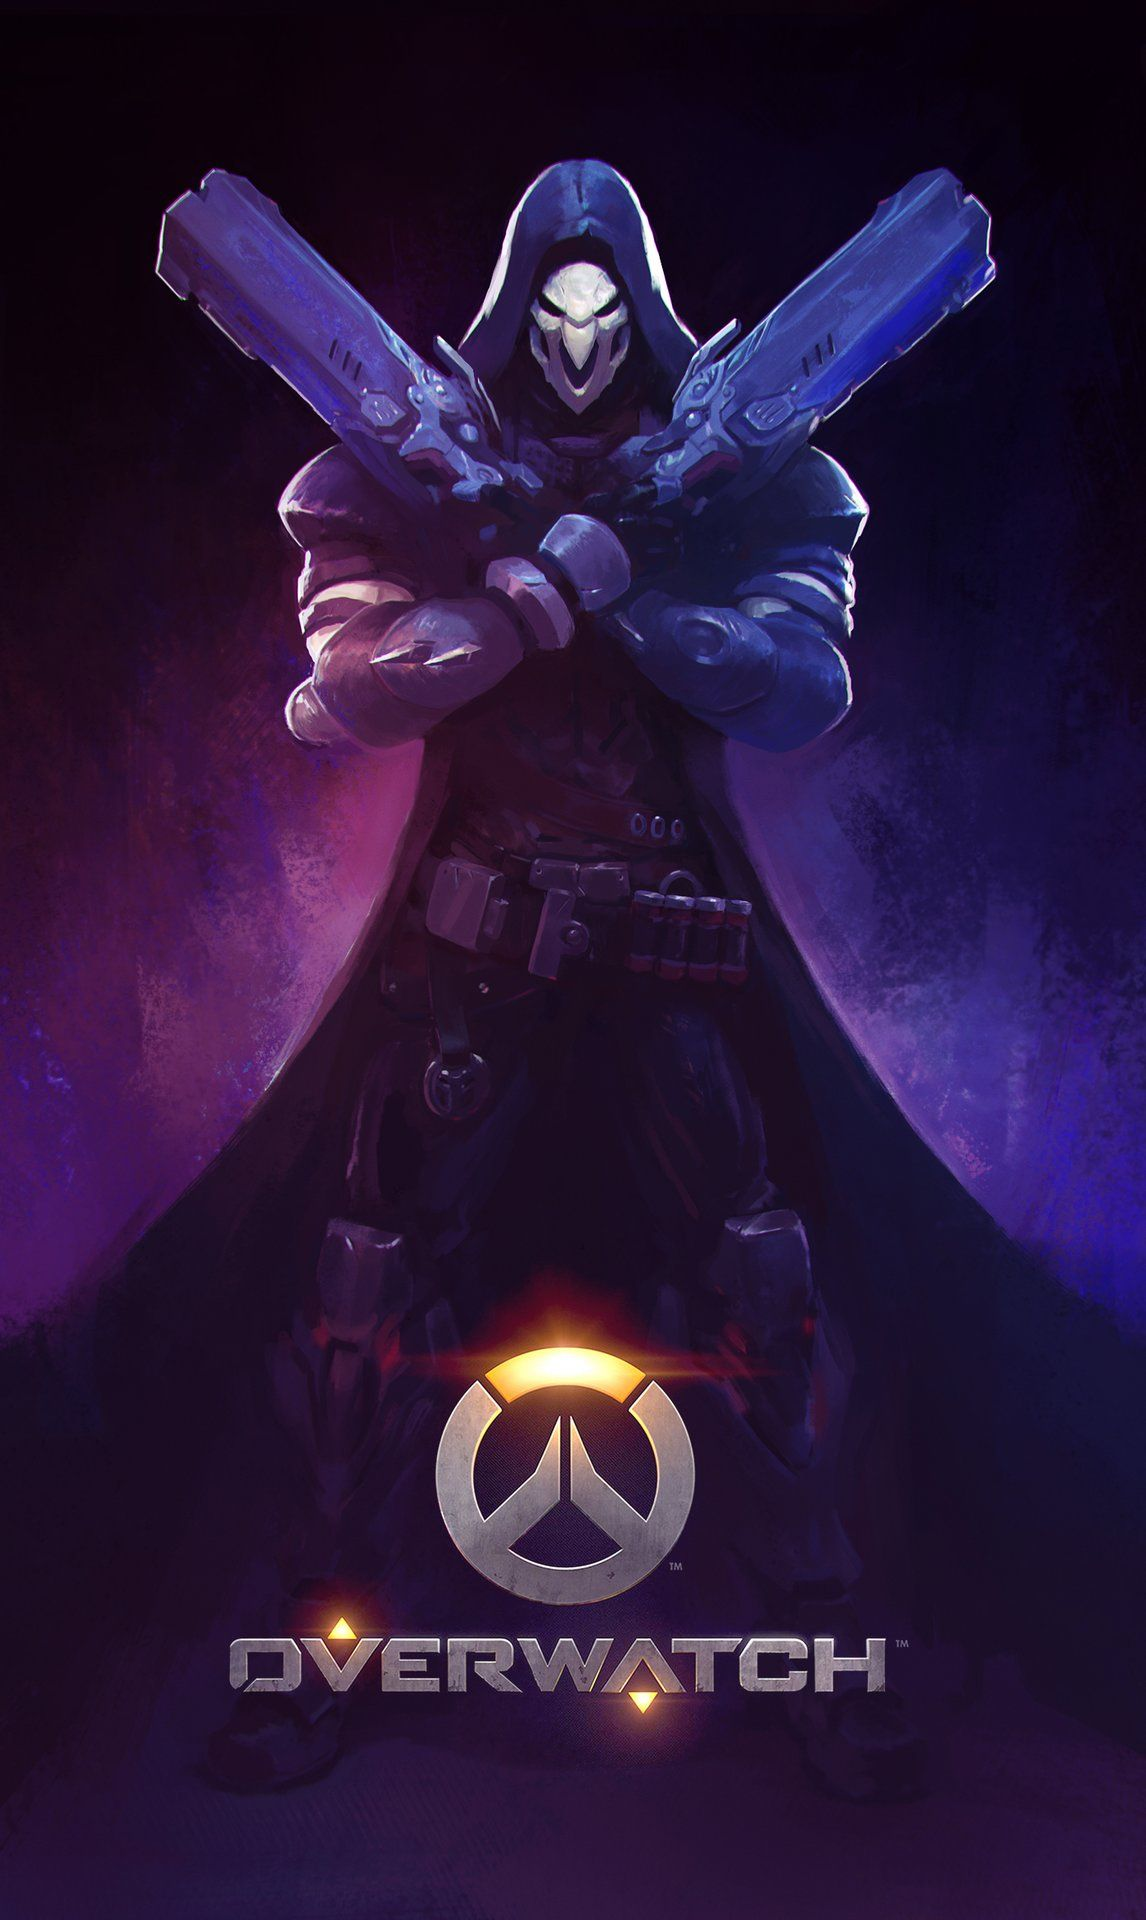 Reaper Sione Salesa Overwatch Wallpapers Overwatch Reaper Overwatch Pictures